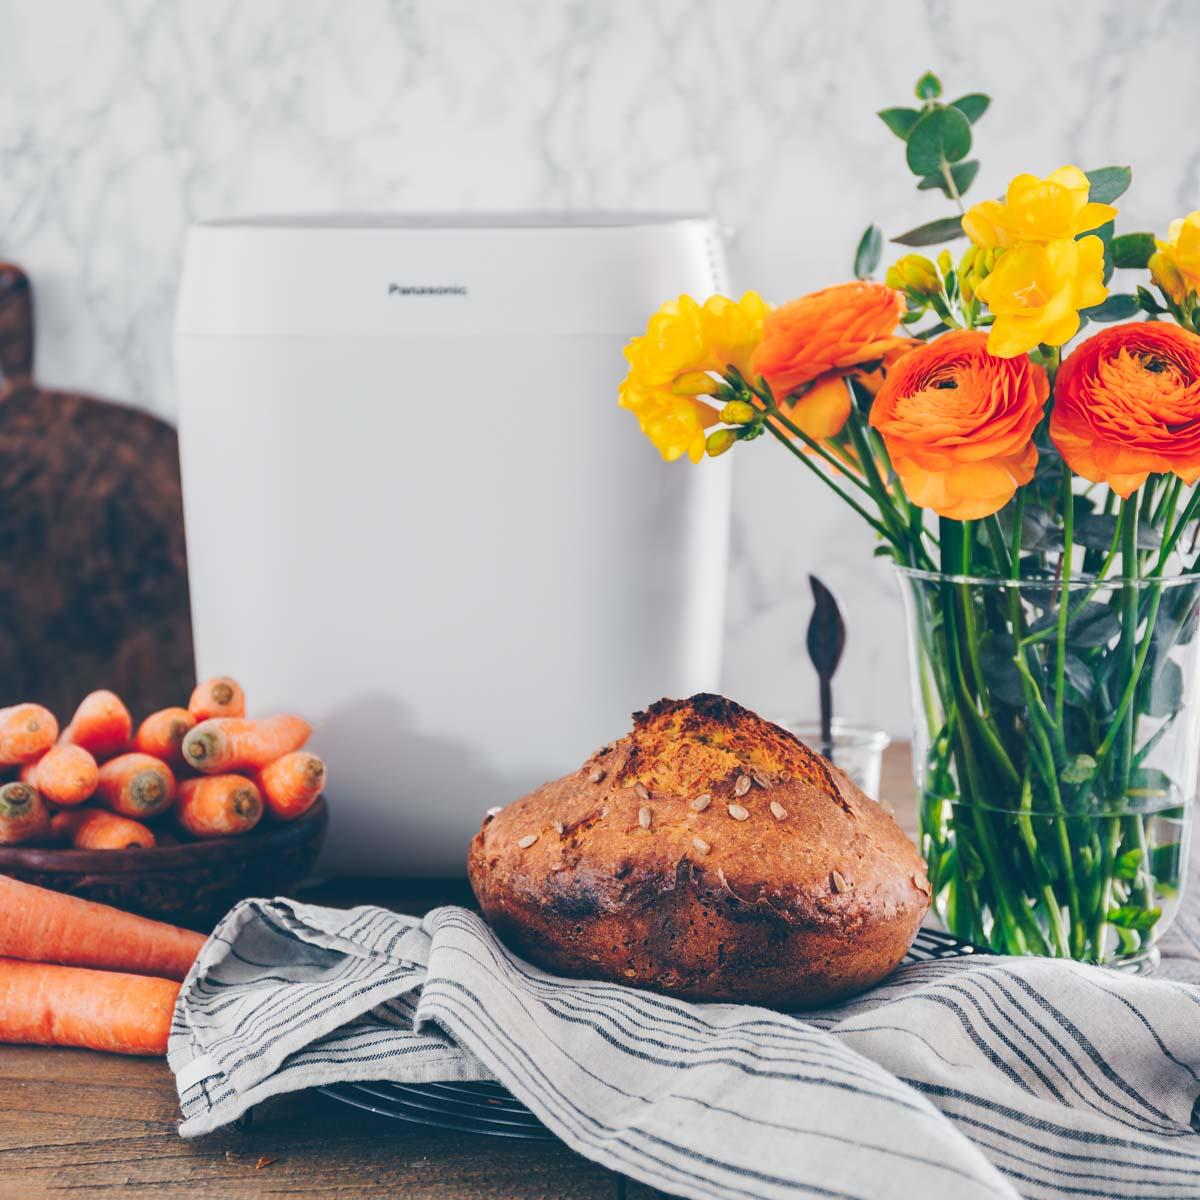 Rüebli-Brot im Brotbackautomat